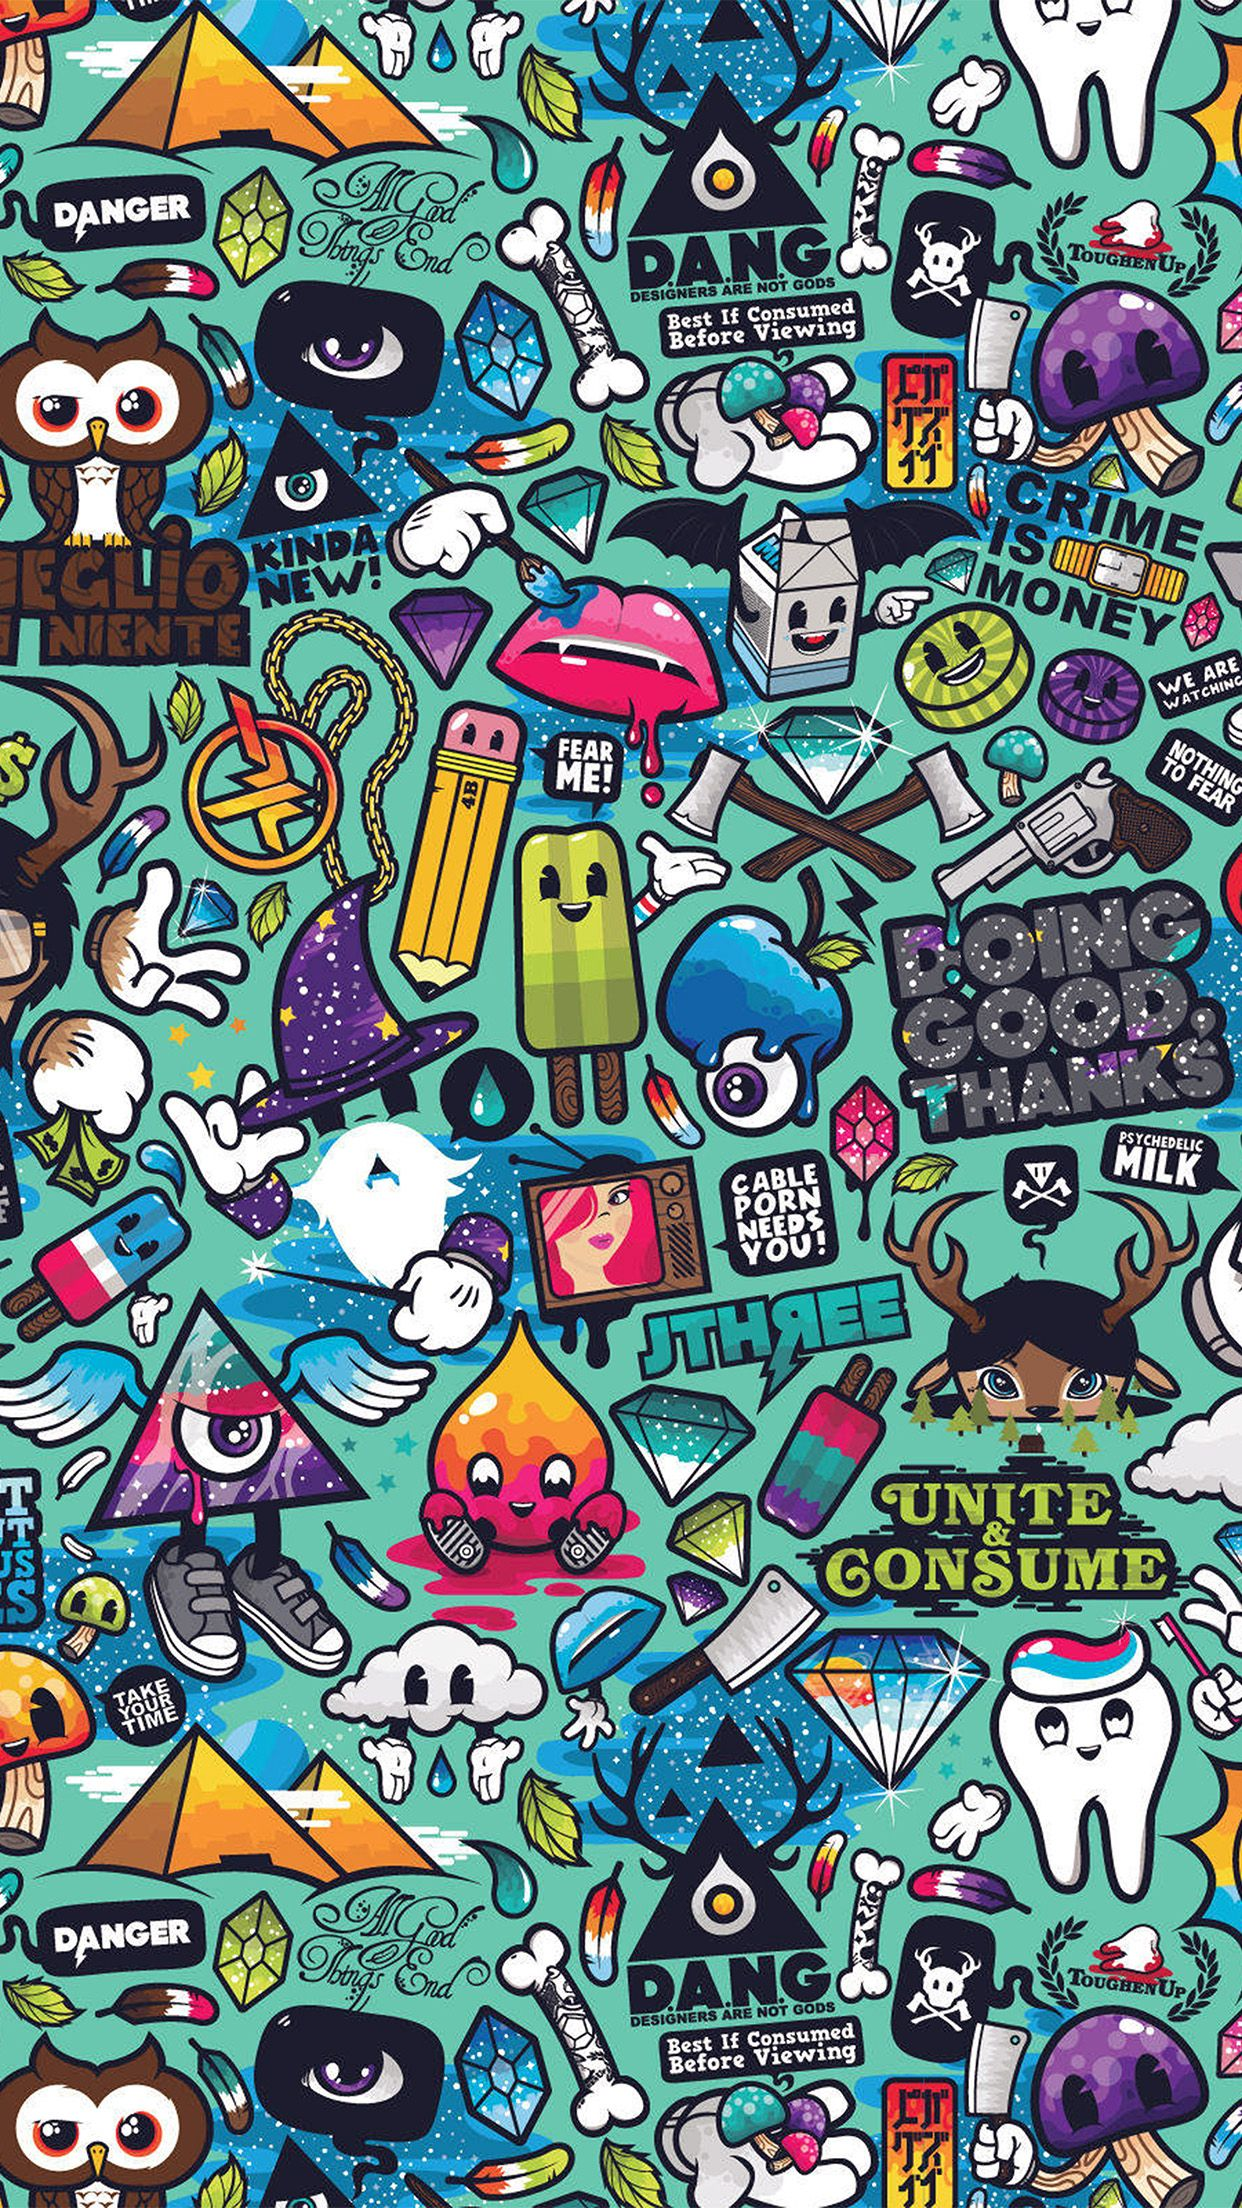 awesome art-work-pattern-illustration-graffiti-iphone6-plus-wallpaper